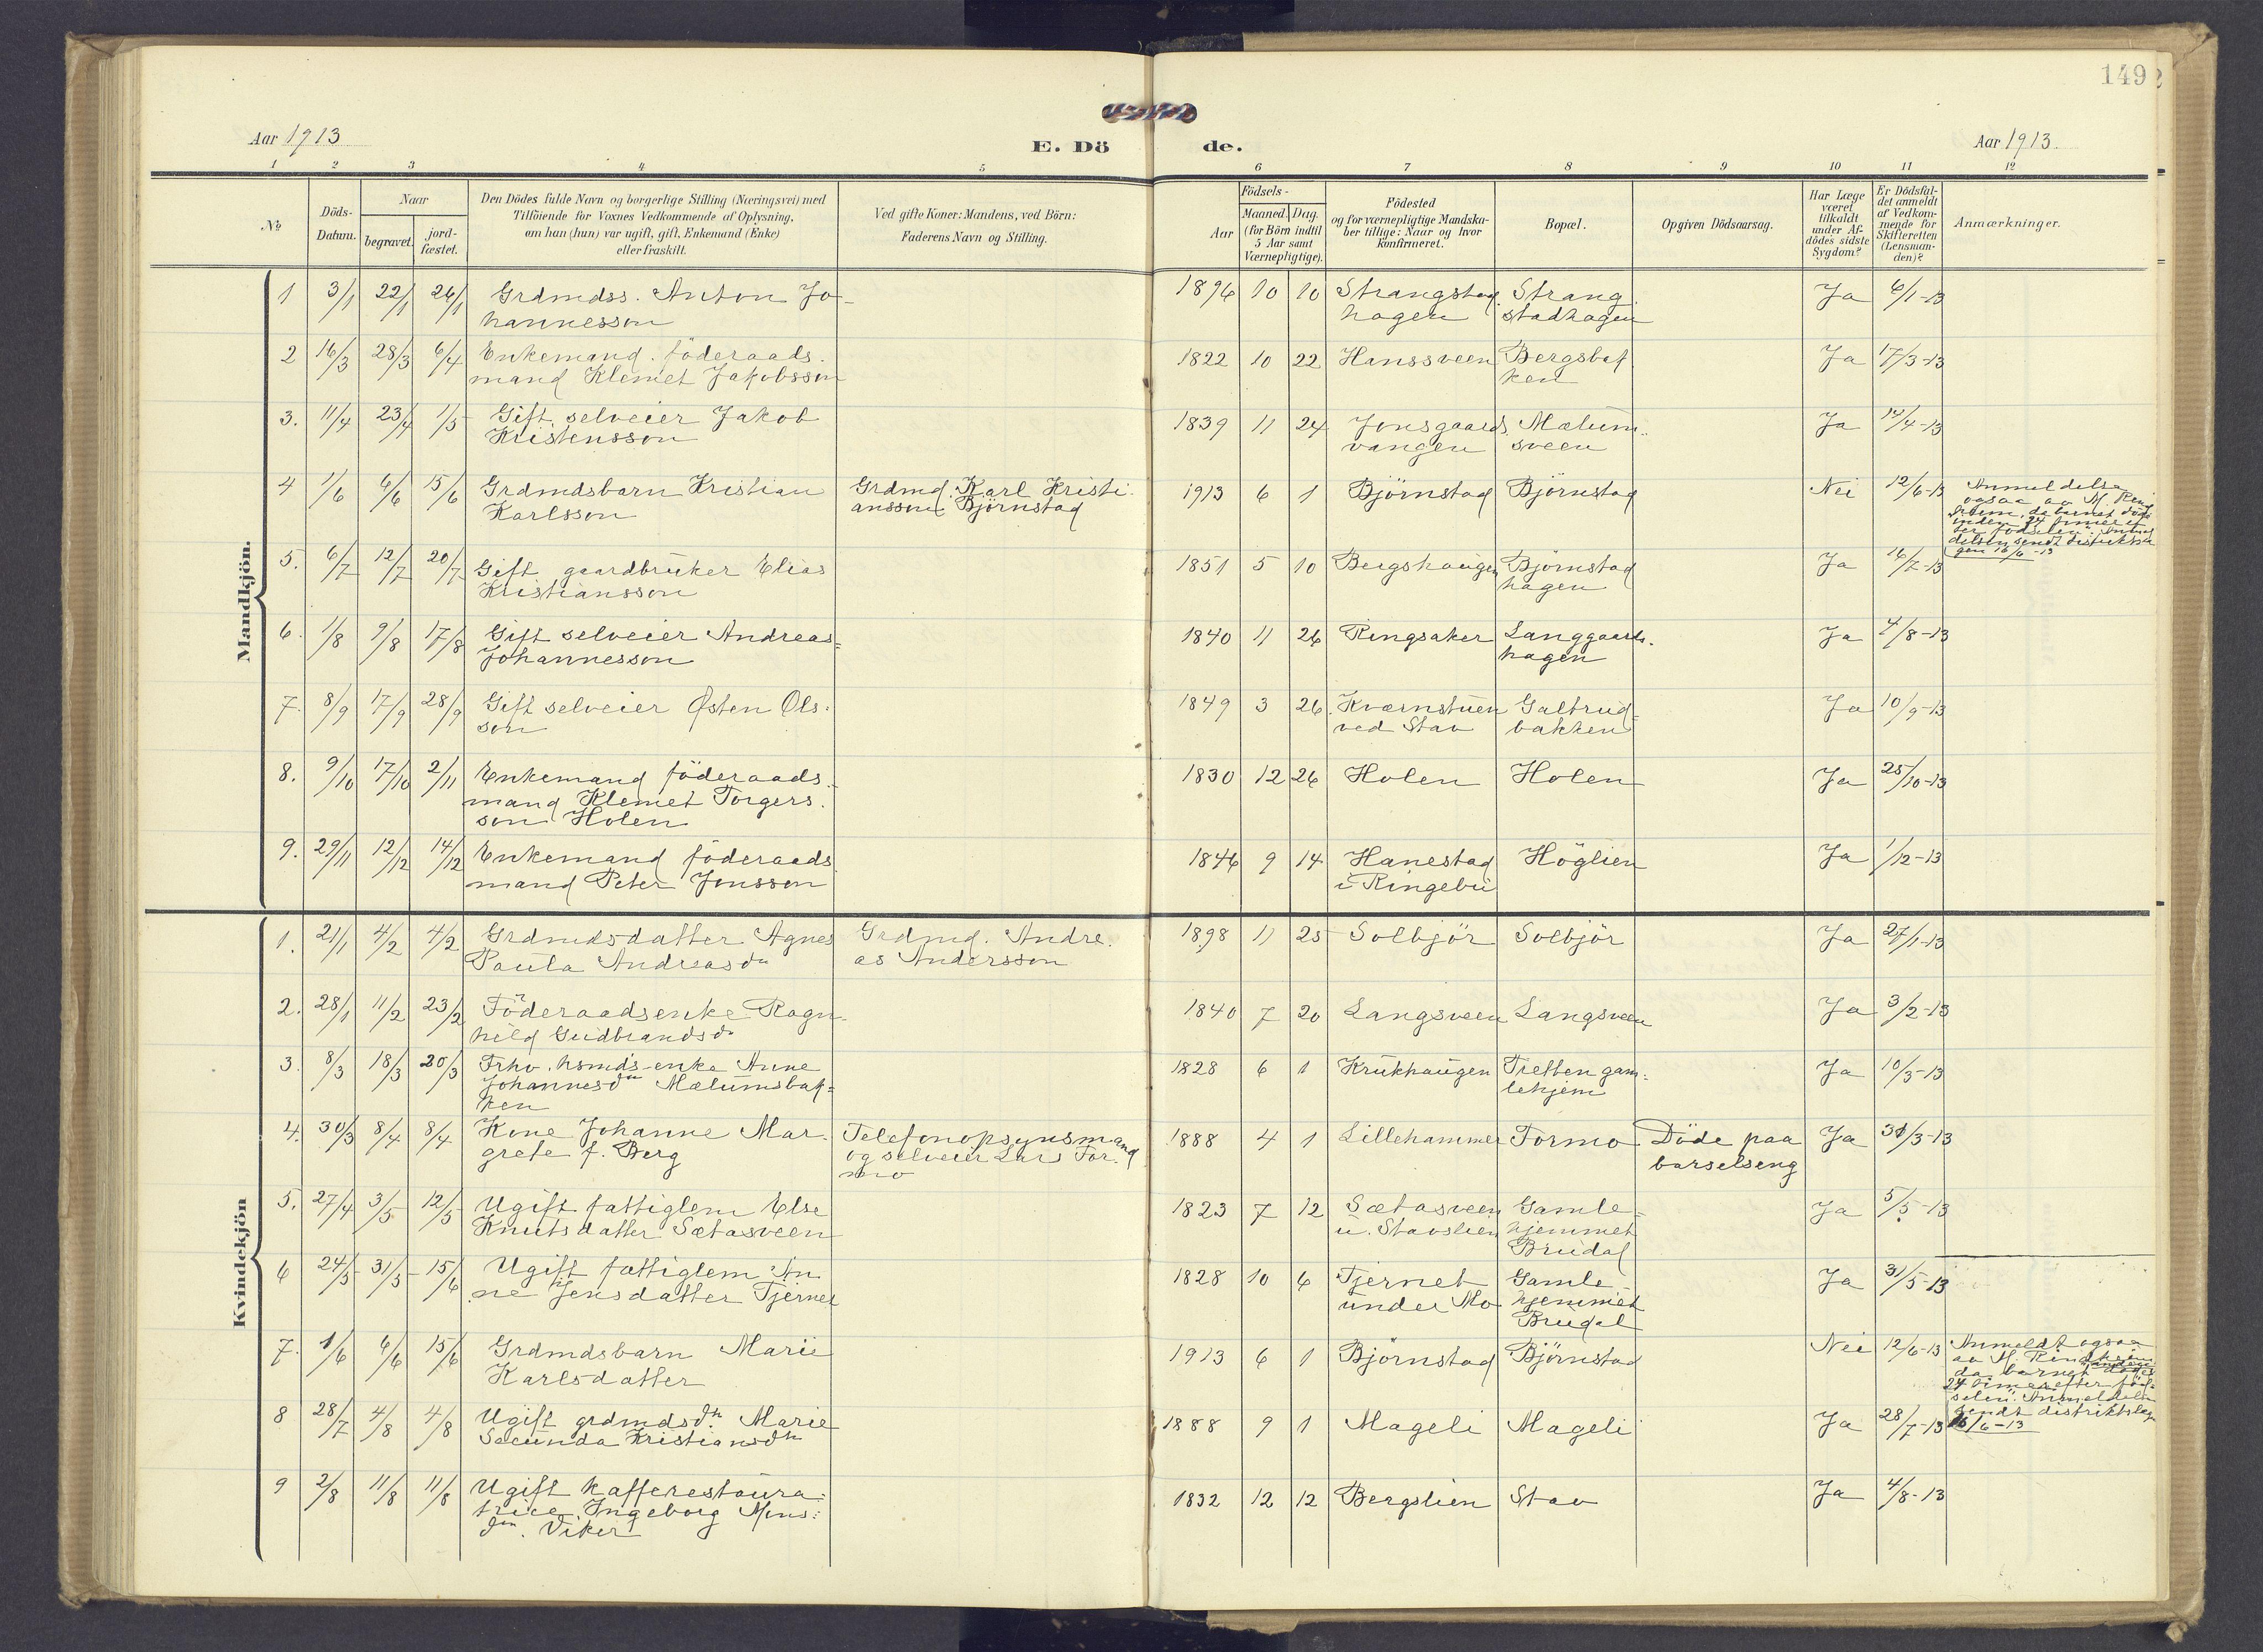 SAH, Øyer prestekontor, Ministerialbok nr. 13, 1905-1920, s. 149